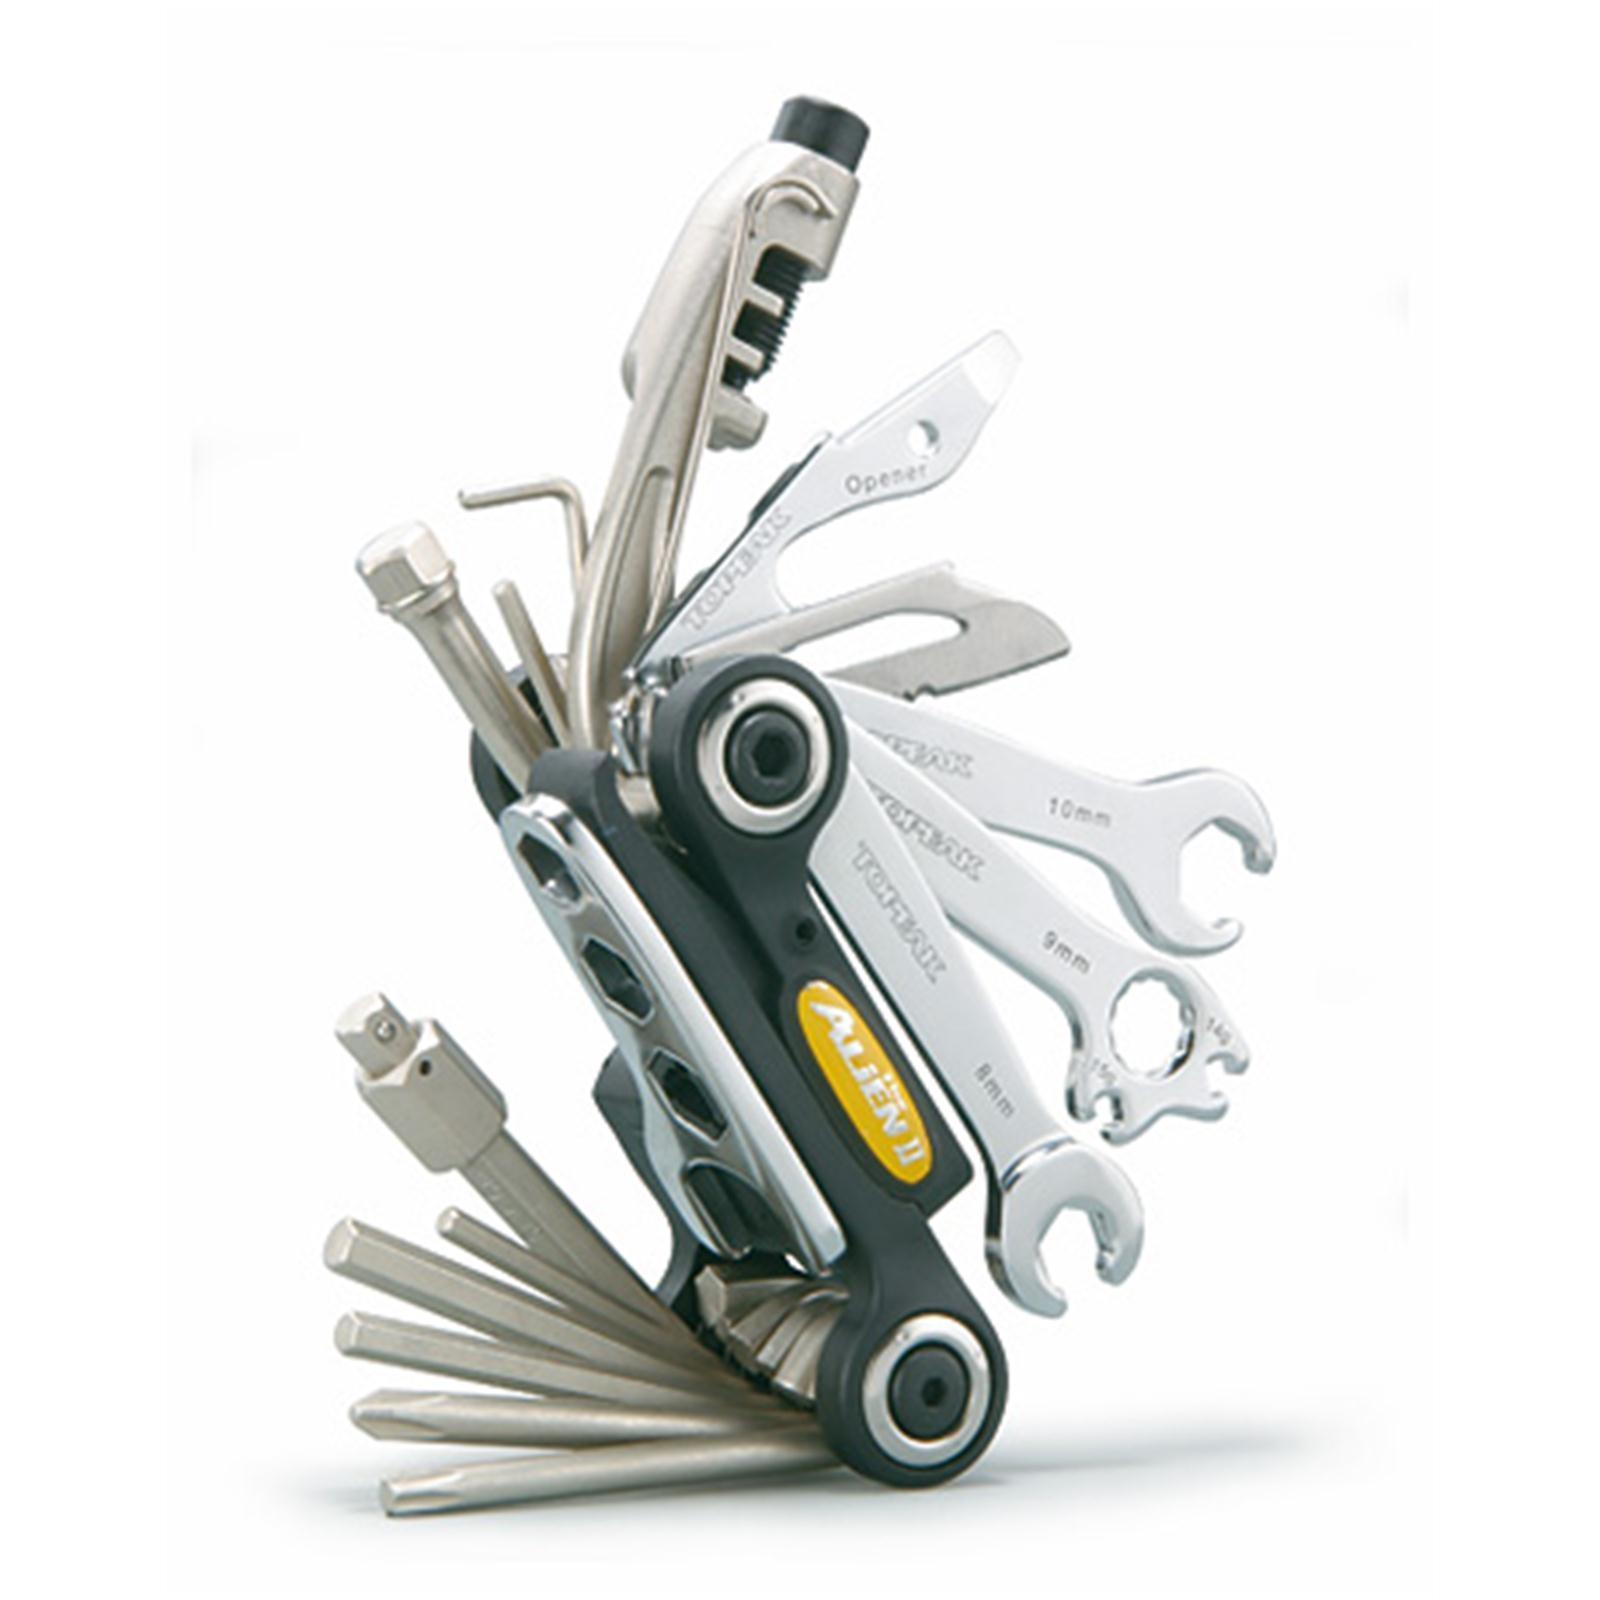 Topeak Mini Funktions Werkzeug Multi Tool Fahrrad MTB Road Kettennieter Kompakt